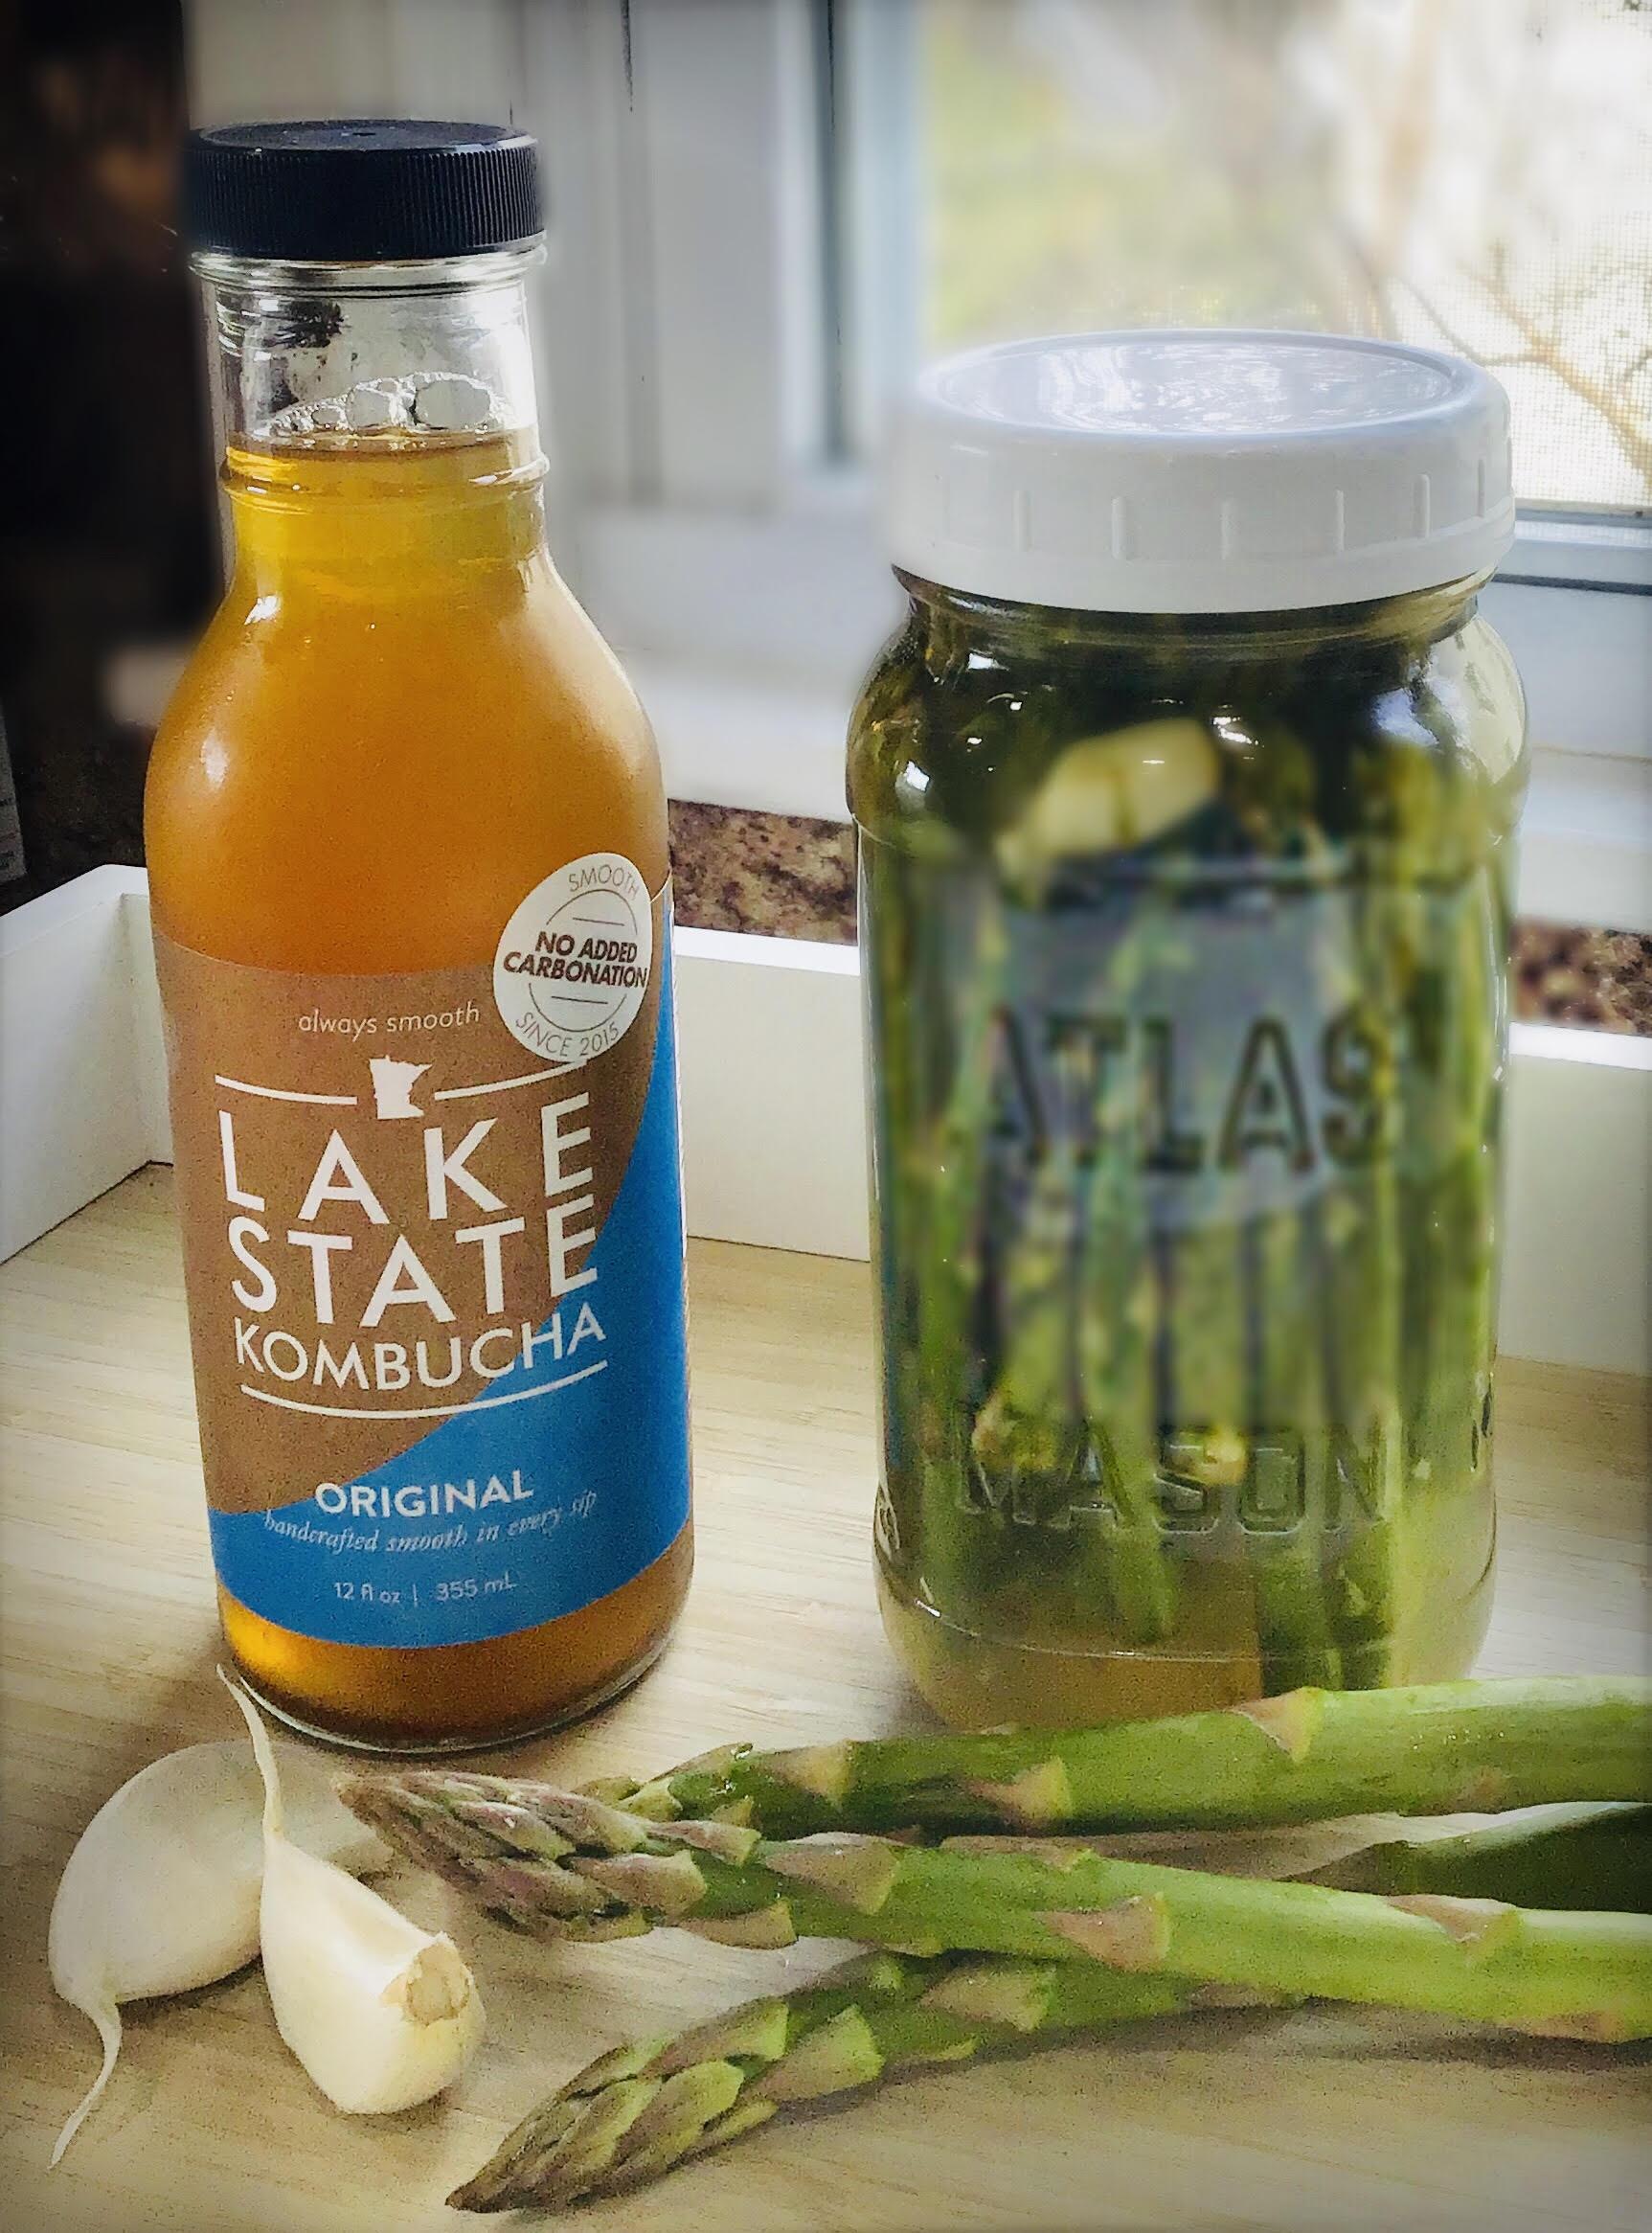 Lake State's Kombucha Fermented Asparagus